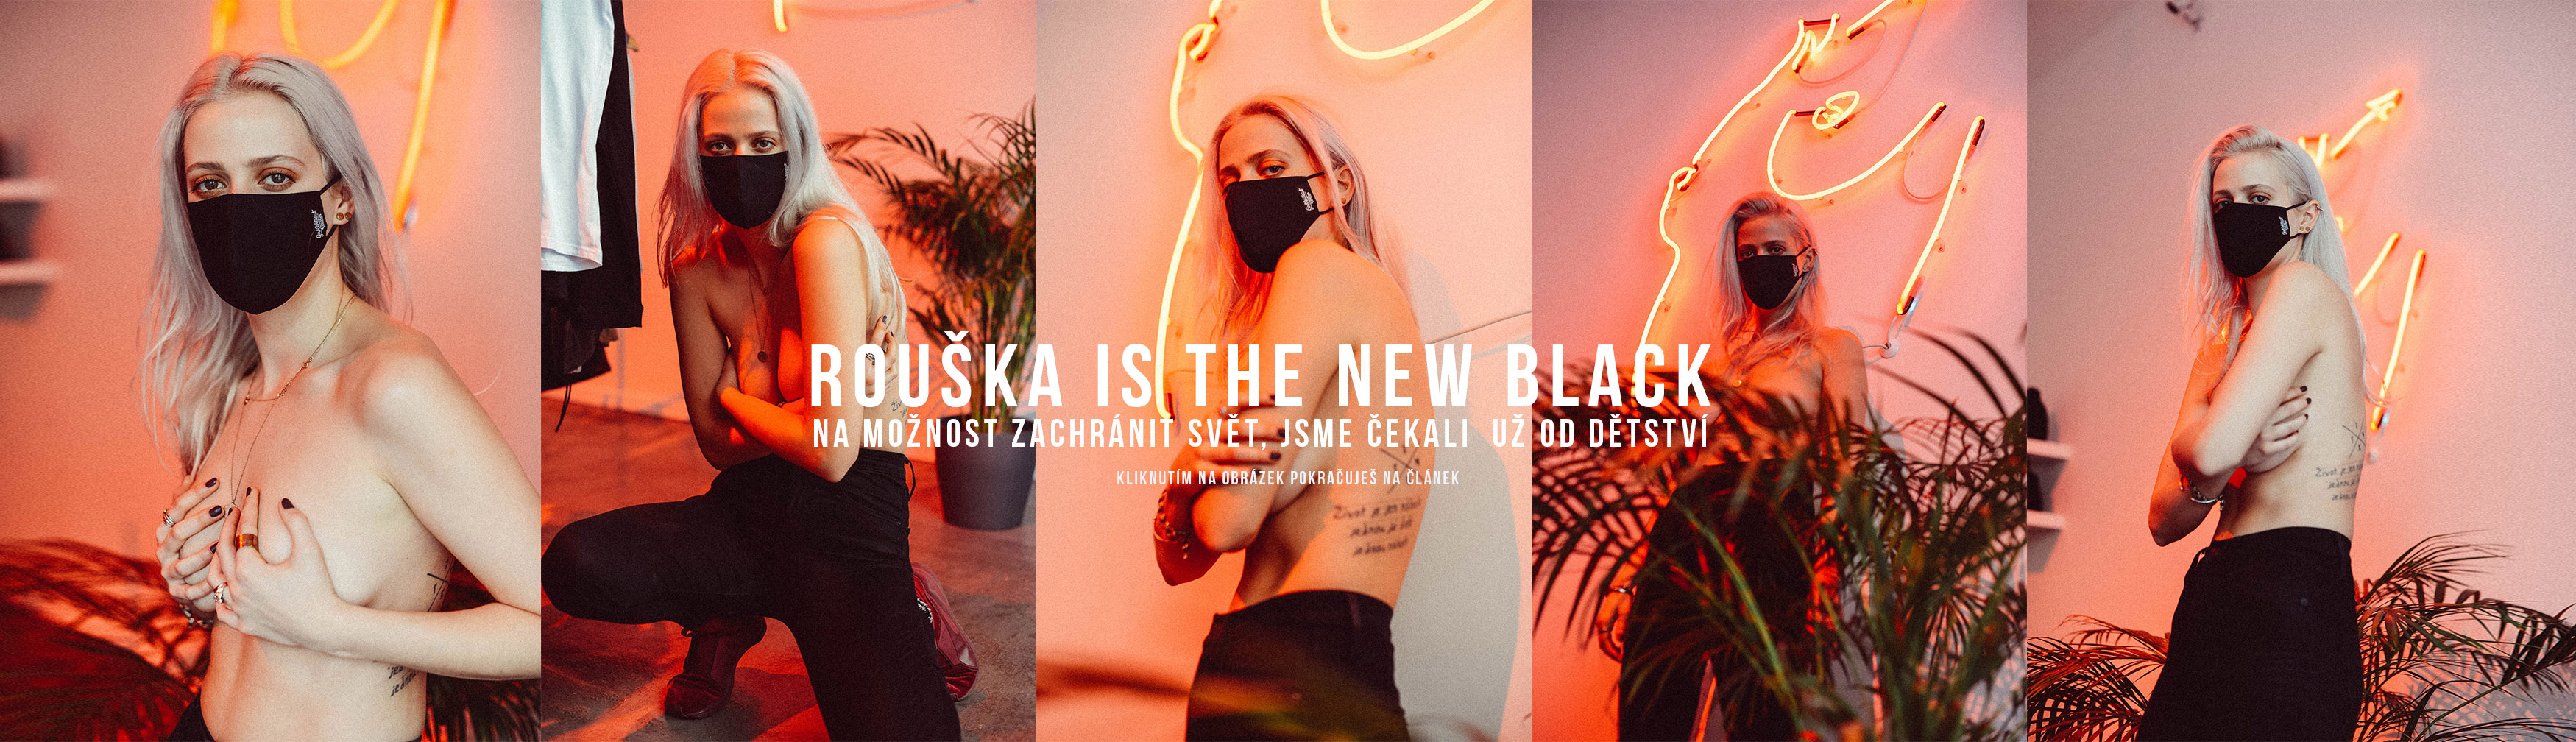 Rouška is the new black